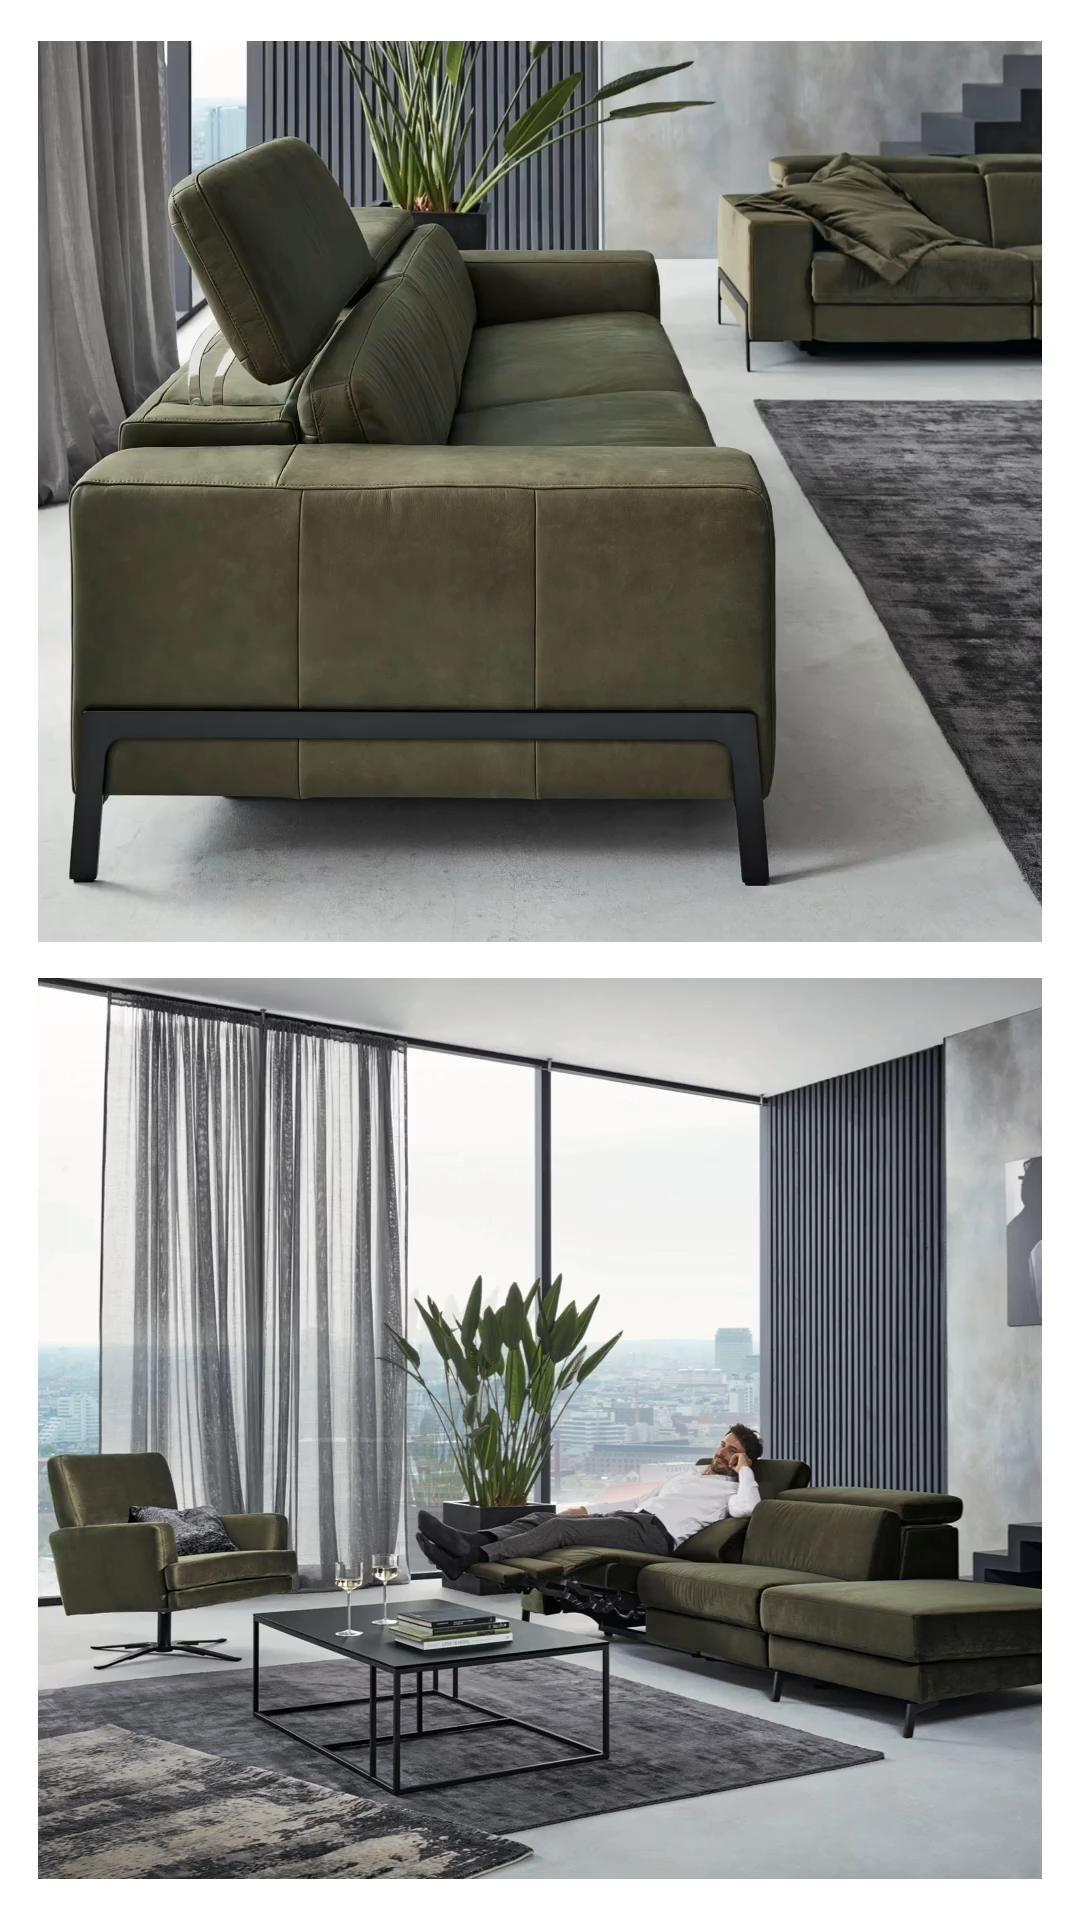 Sofa mit viel Komfort